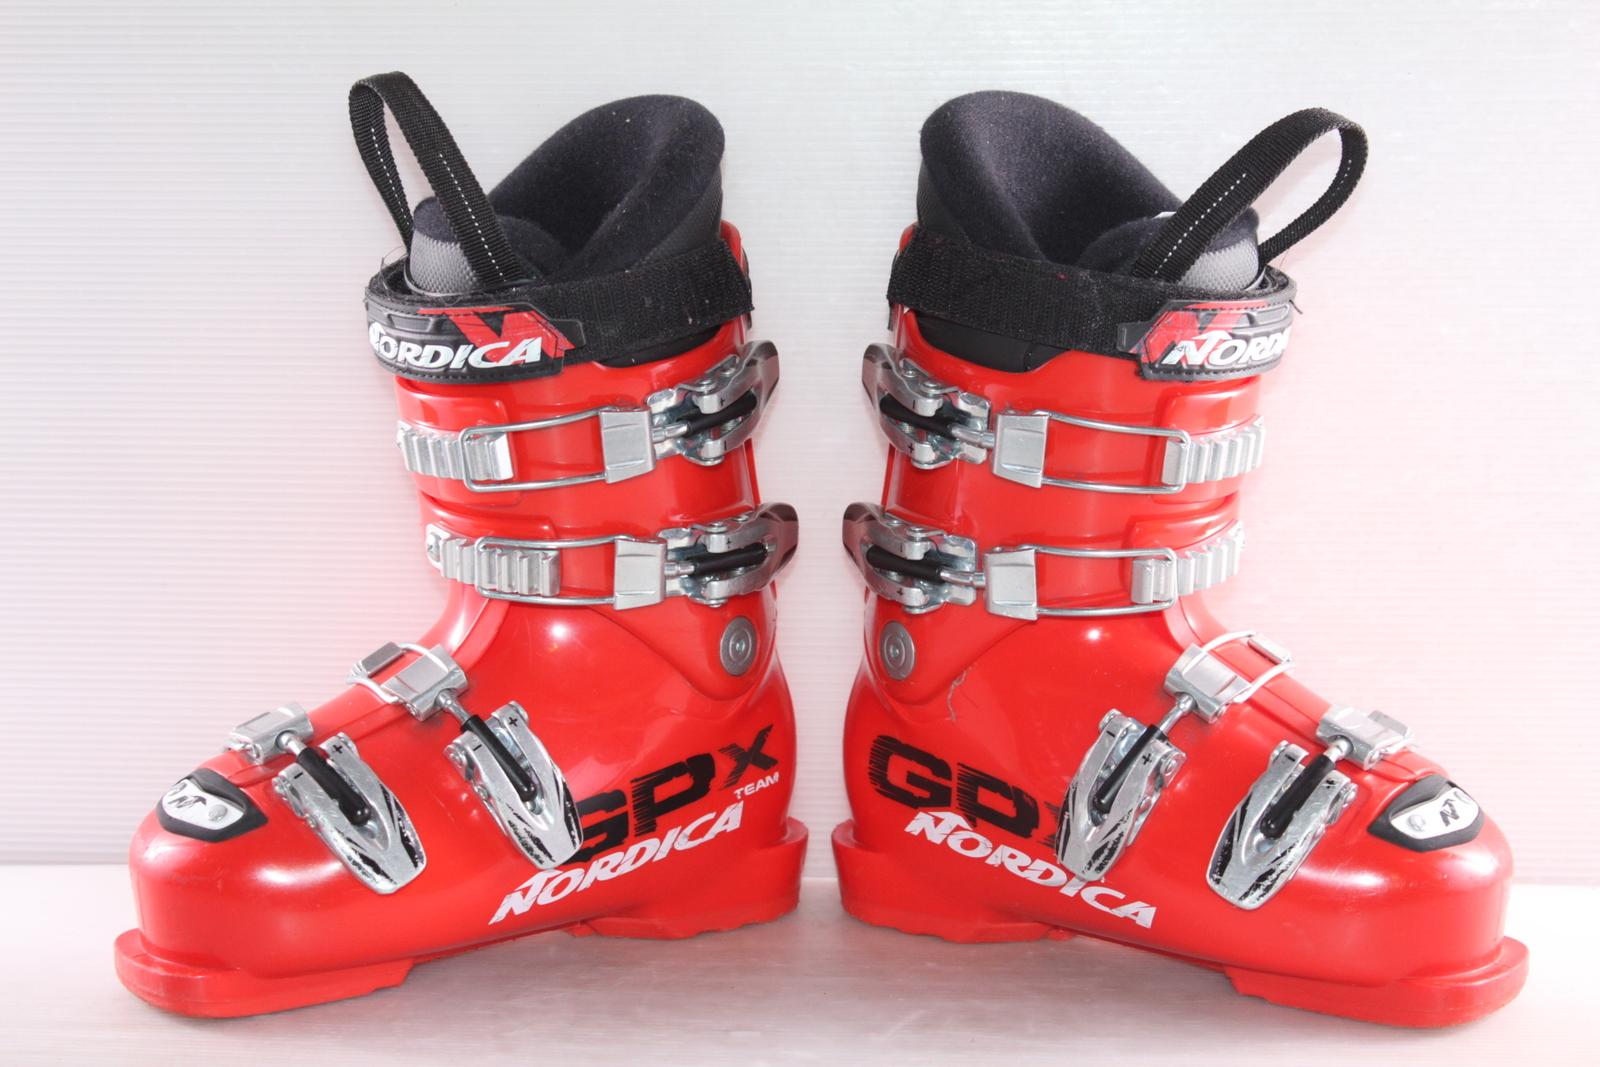 Dětské lyžáky Nordica GPX Team vel. EU31